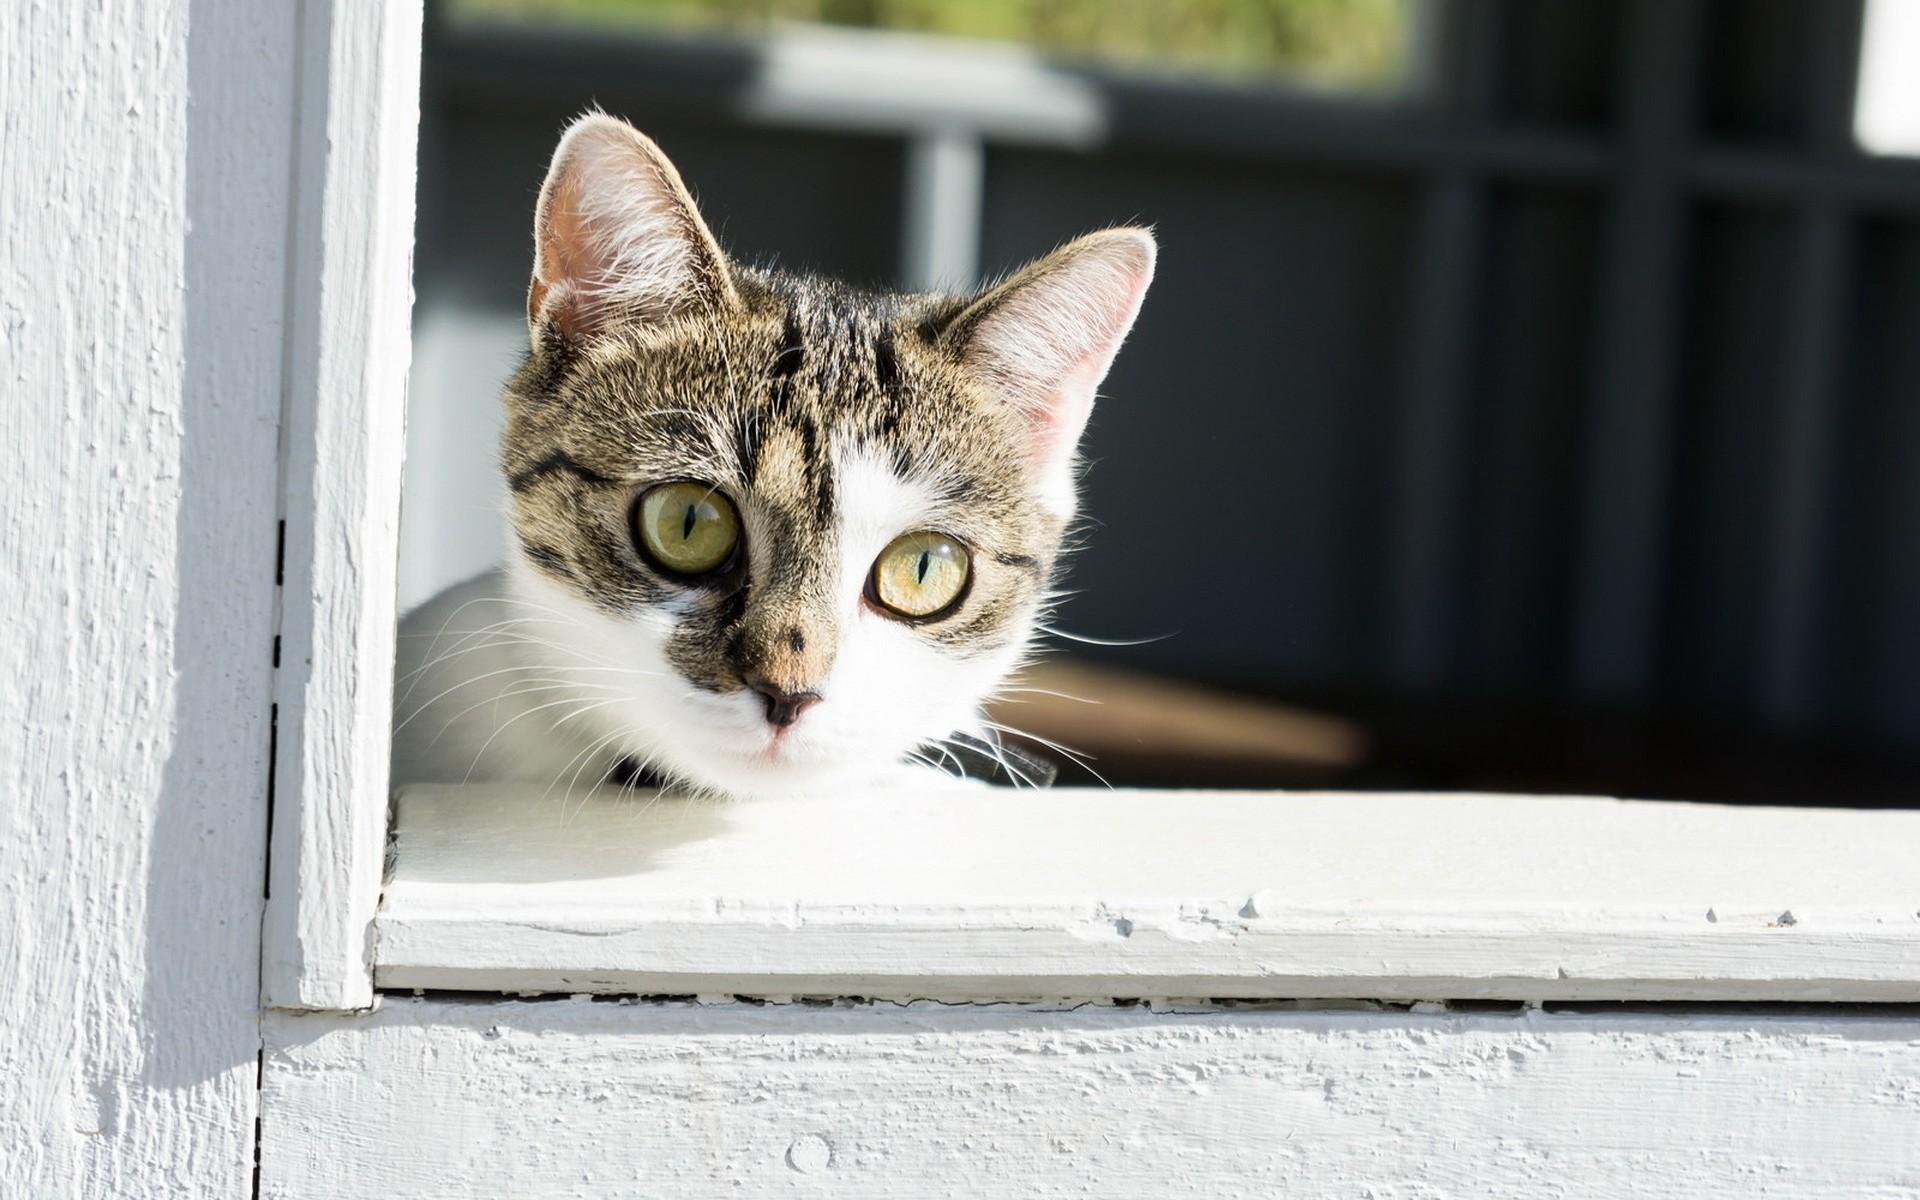 котята на окне kittens on the window  № 3063206 бесплатно